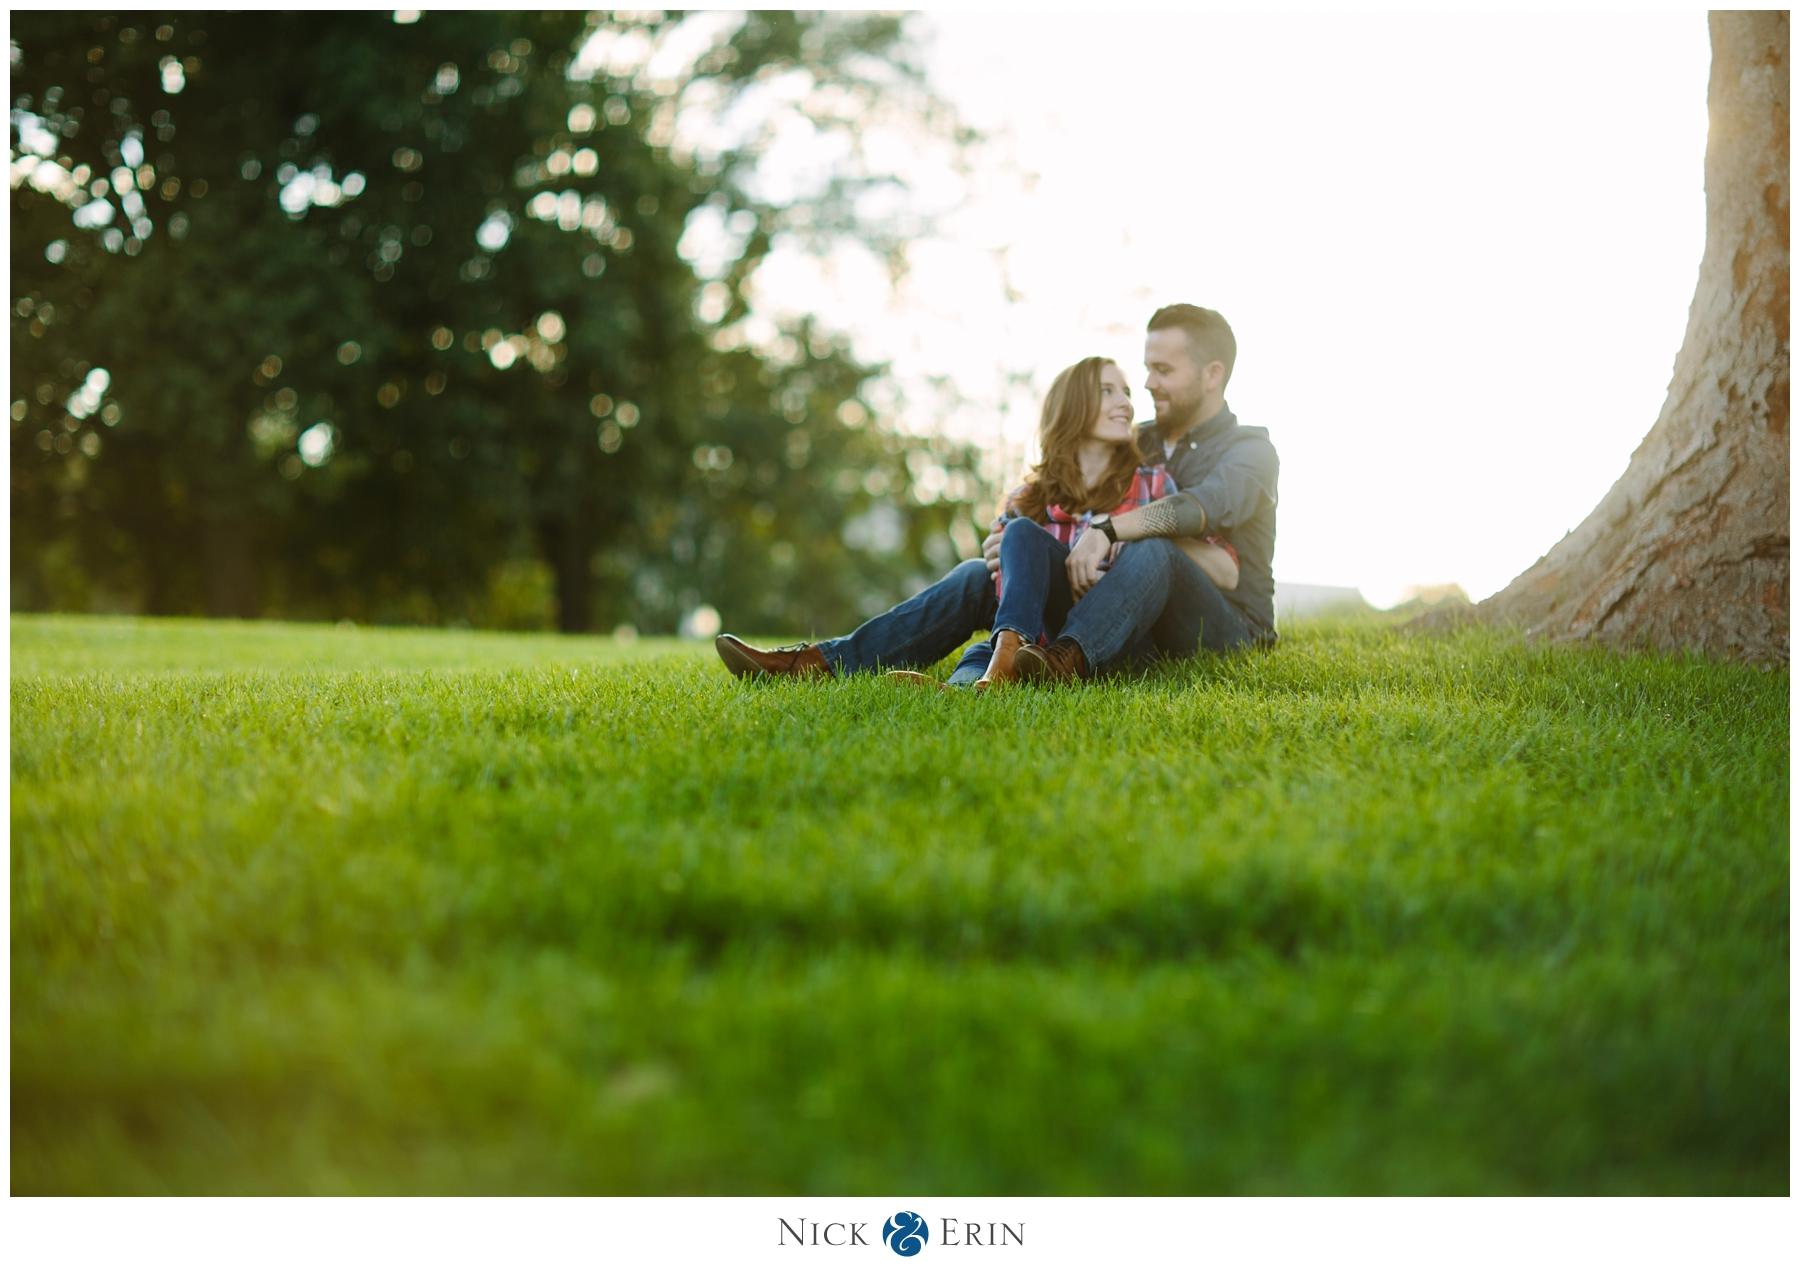 donner_photography_washington-dc-engagement_erin-thom_0022